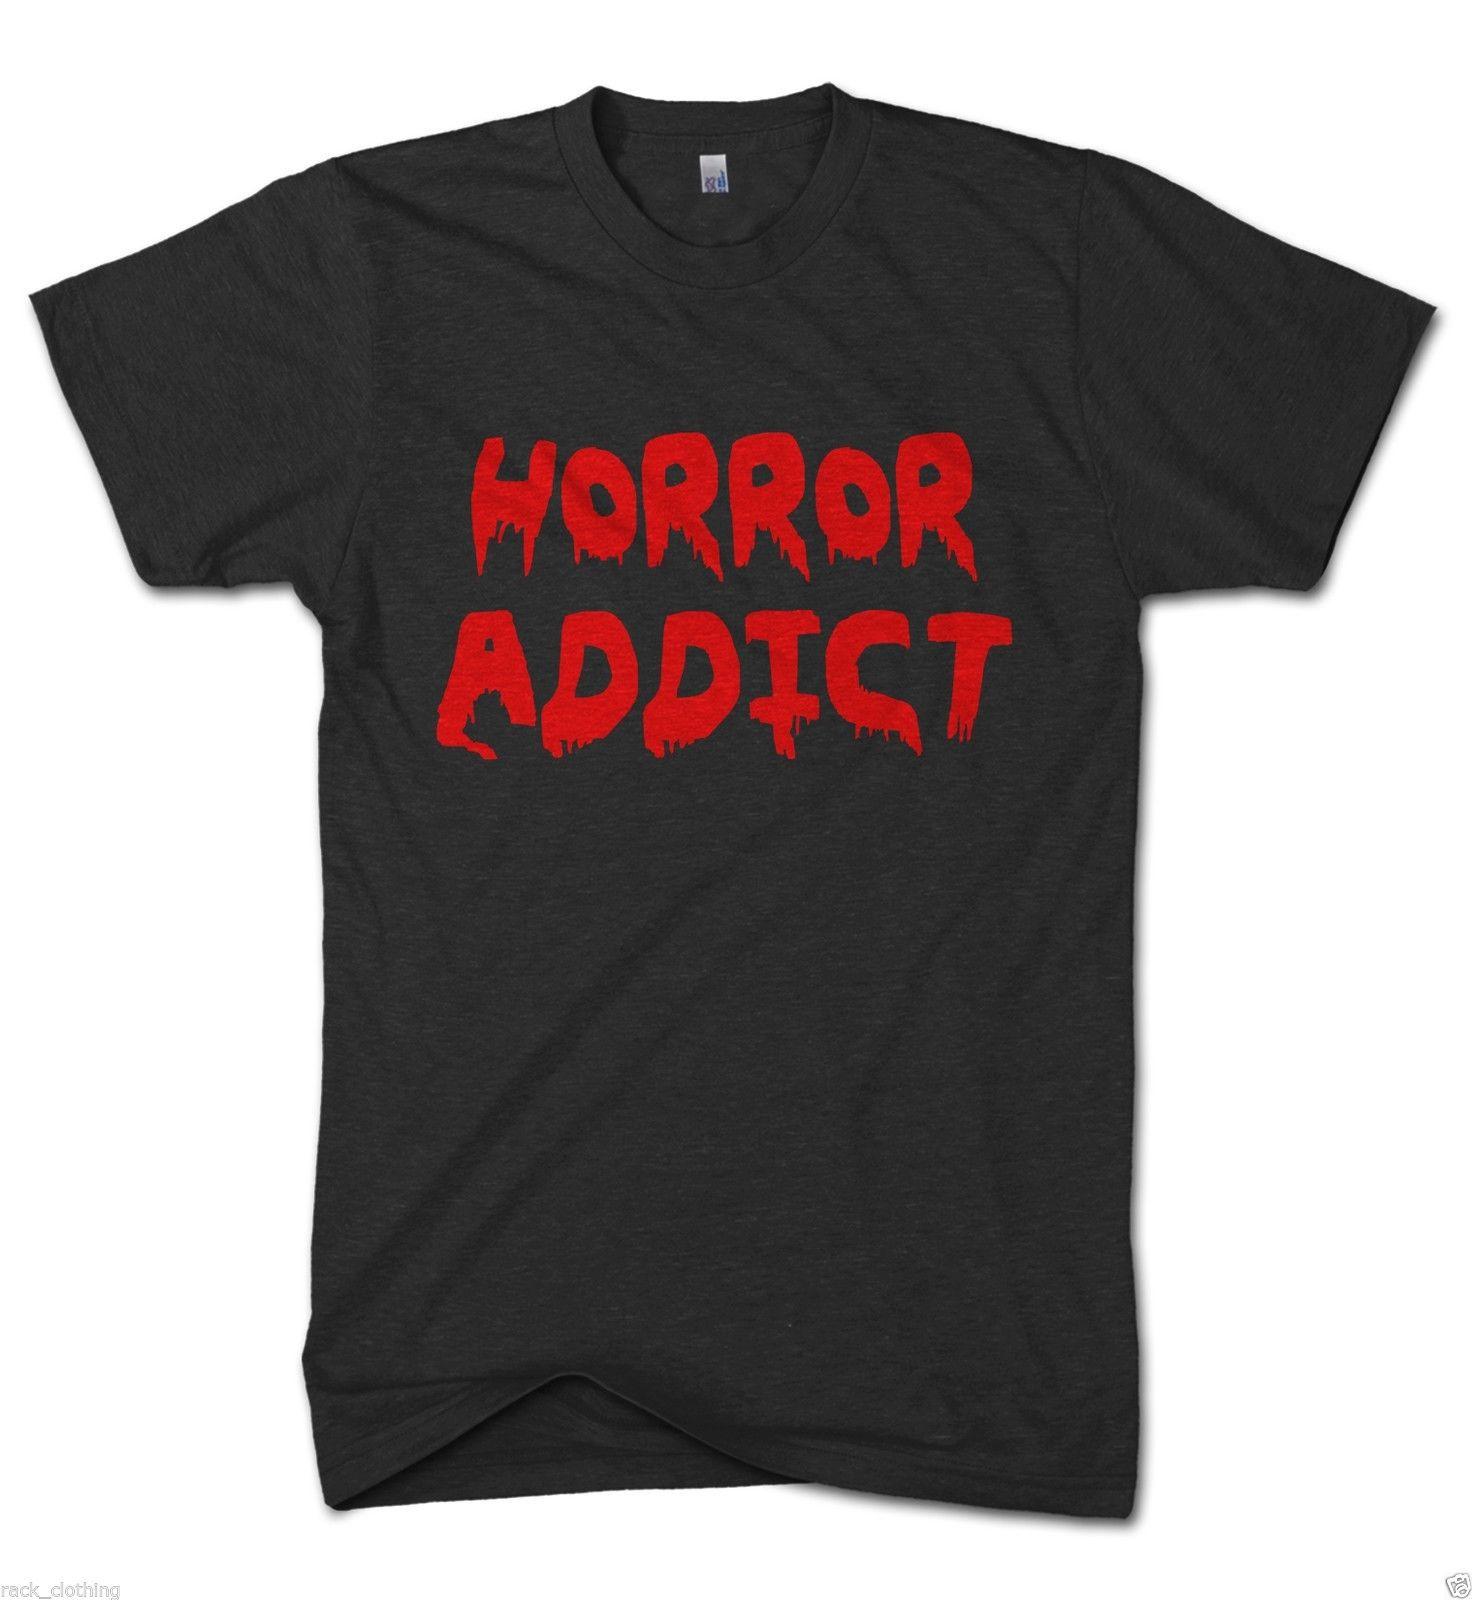 Horror Addict Funny Movie Mens Tshirt Scary Film t shirt I Love